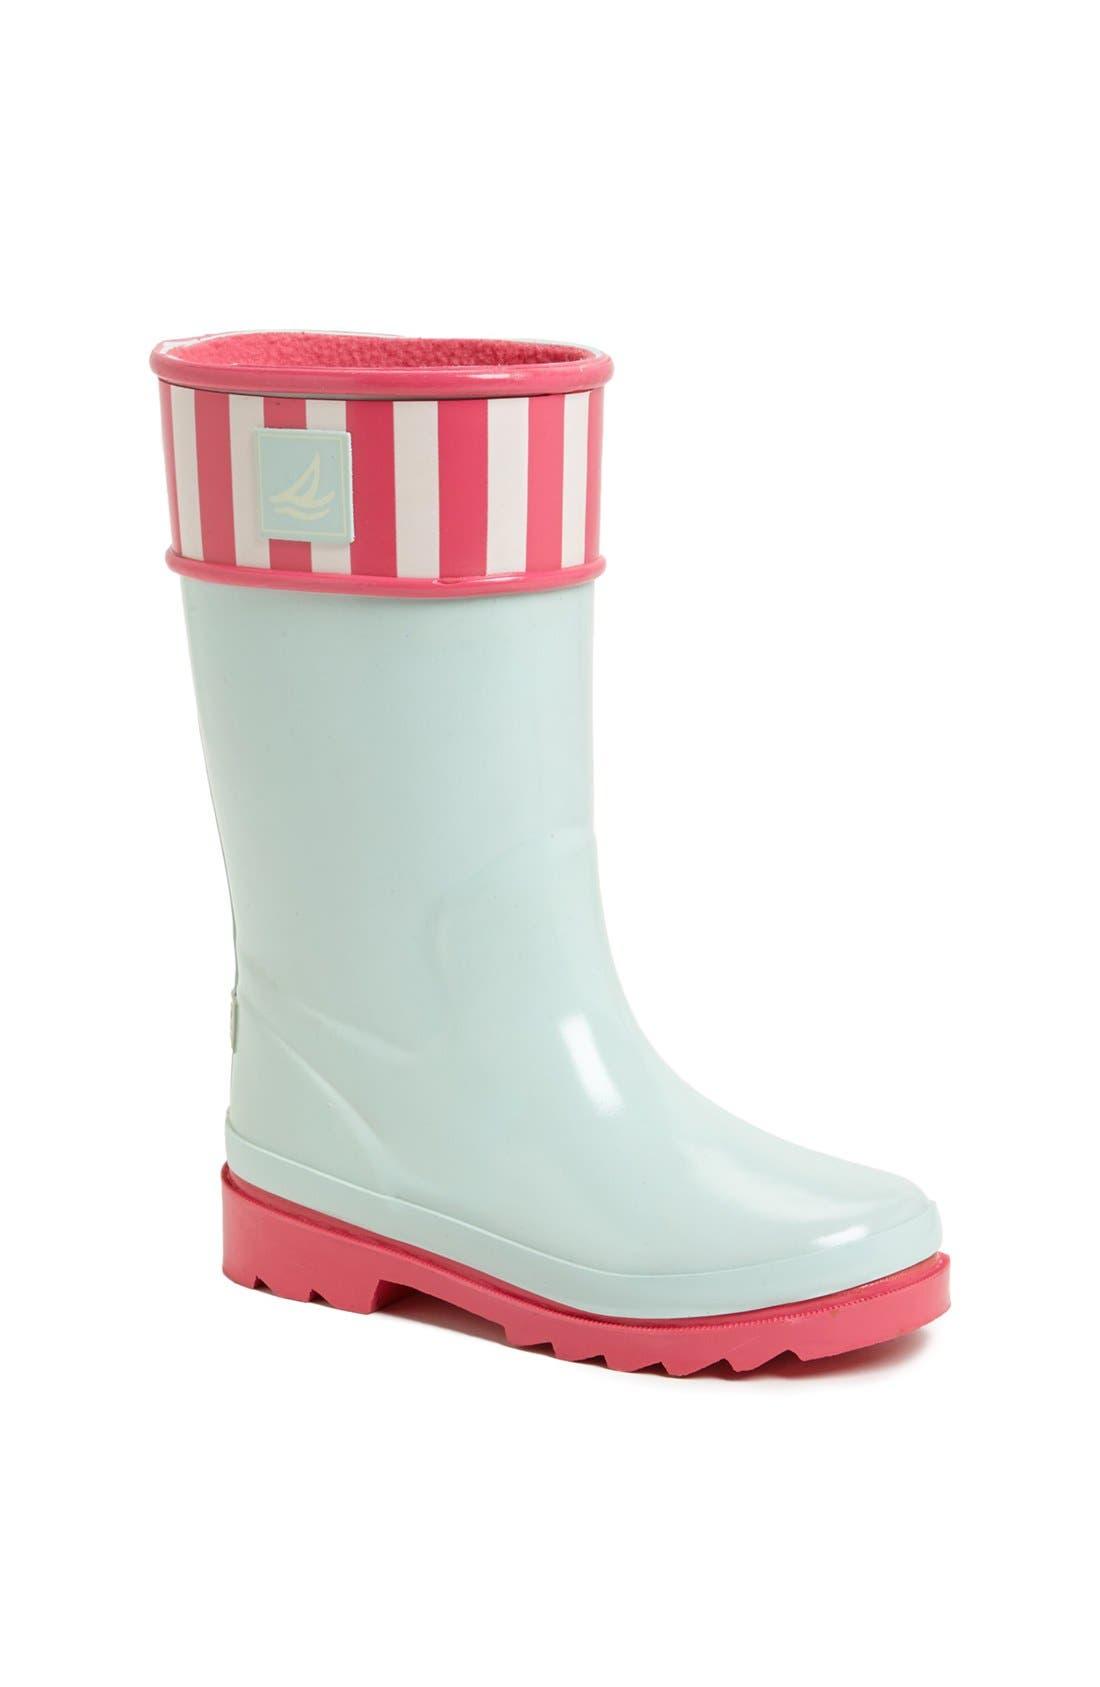 Alternate Image 1 Selected - Sperry Top-Sider® Kids 'Pelican' Rain Boot (Walker, Toddler, Little Kid & Big Kid)